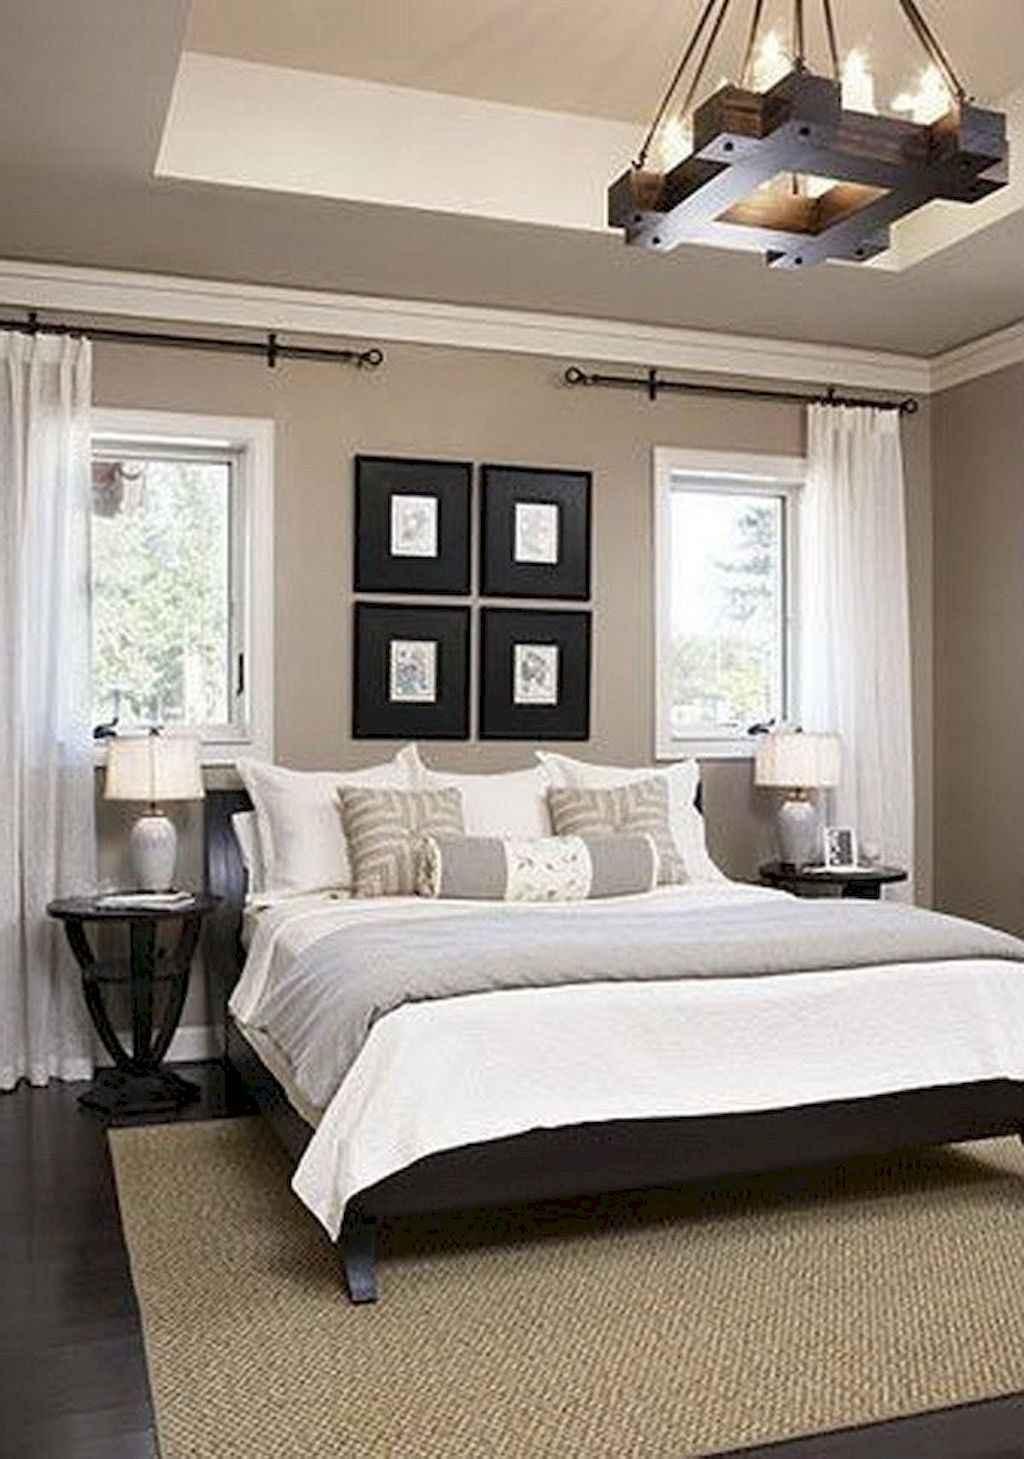 Incredible master bedroom ideas (64)